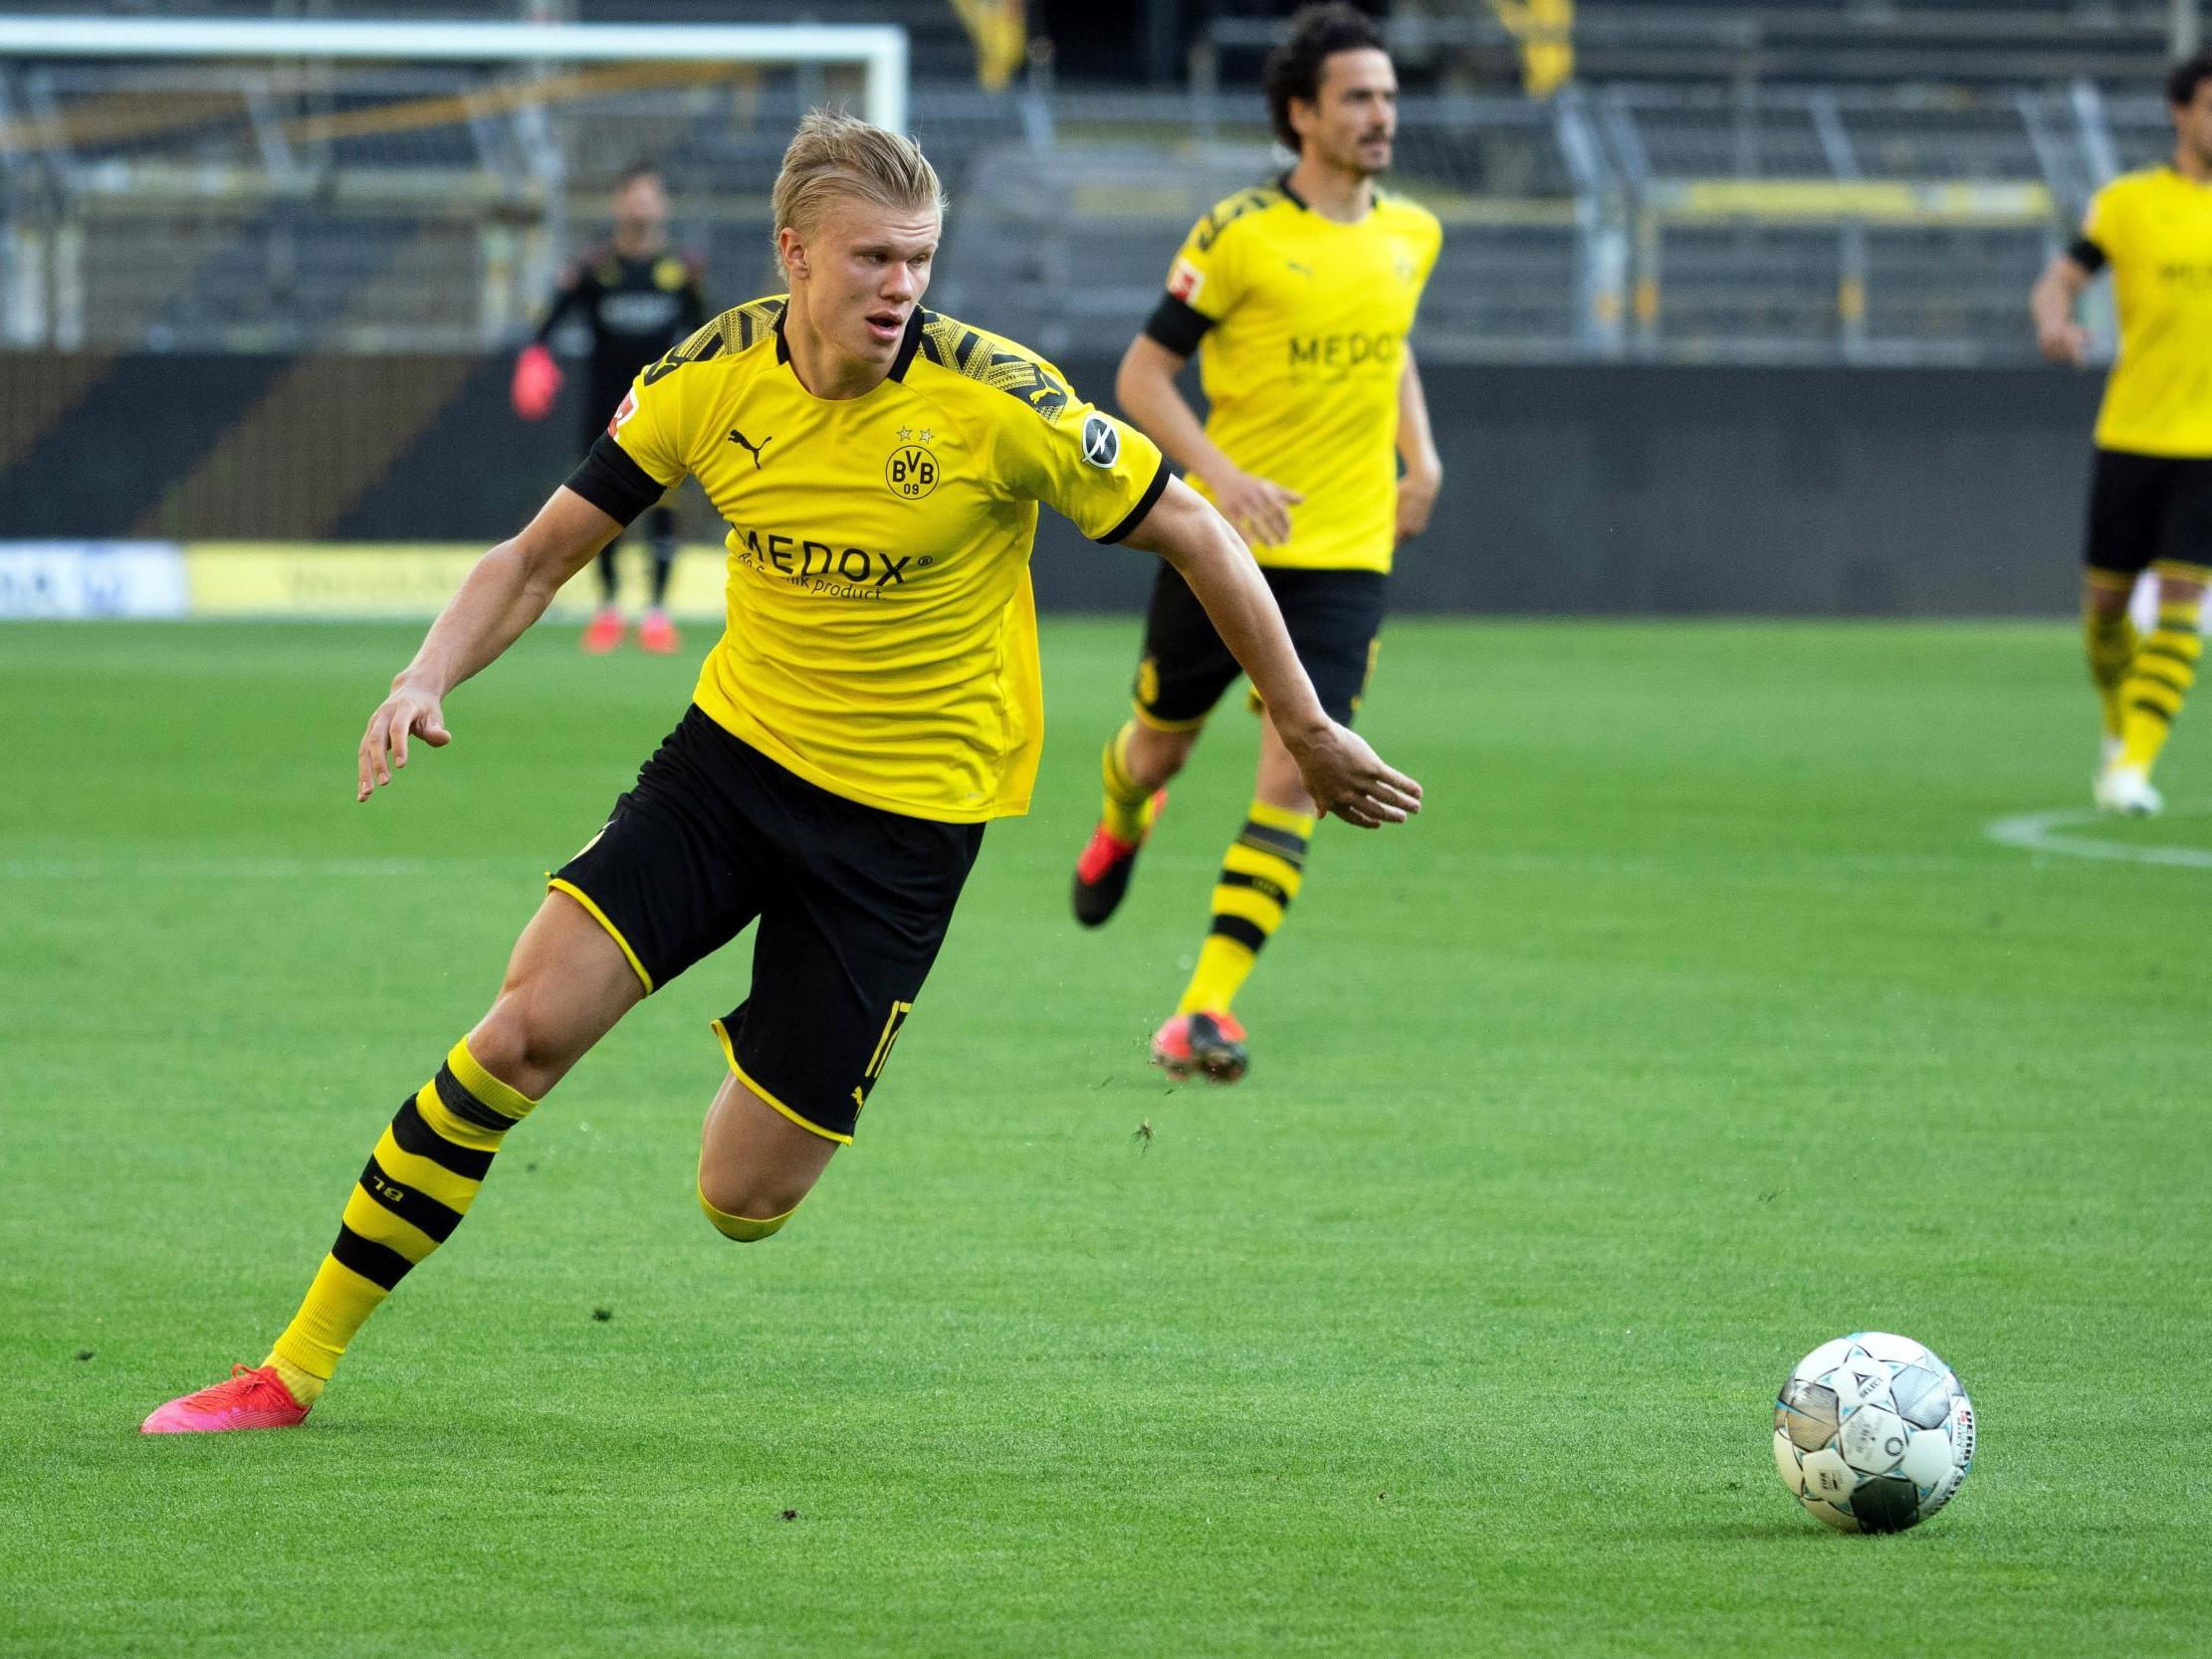 Erling Haaland to miss Borussia Dortmund's Bundesliga fixture with Paderborn